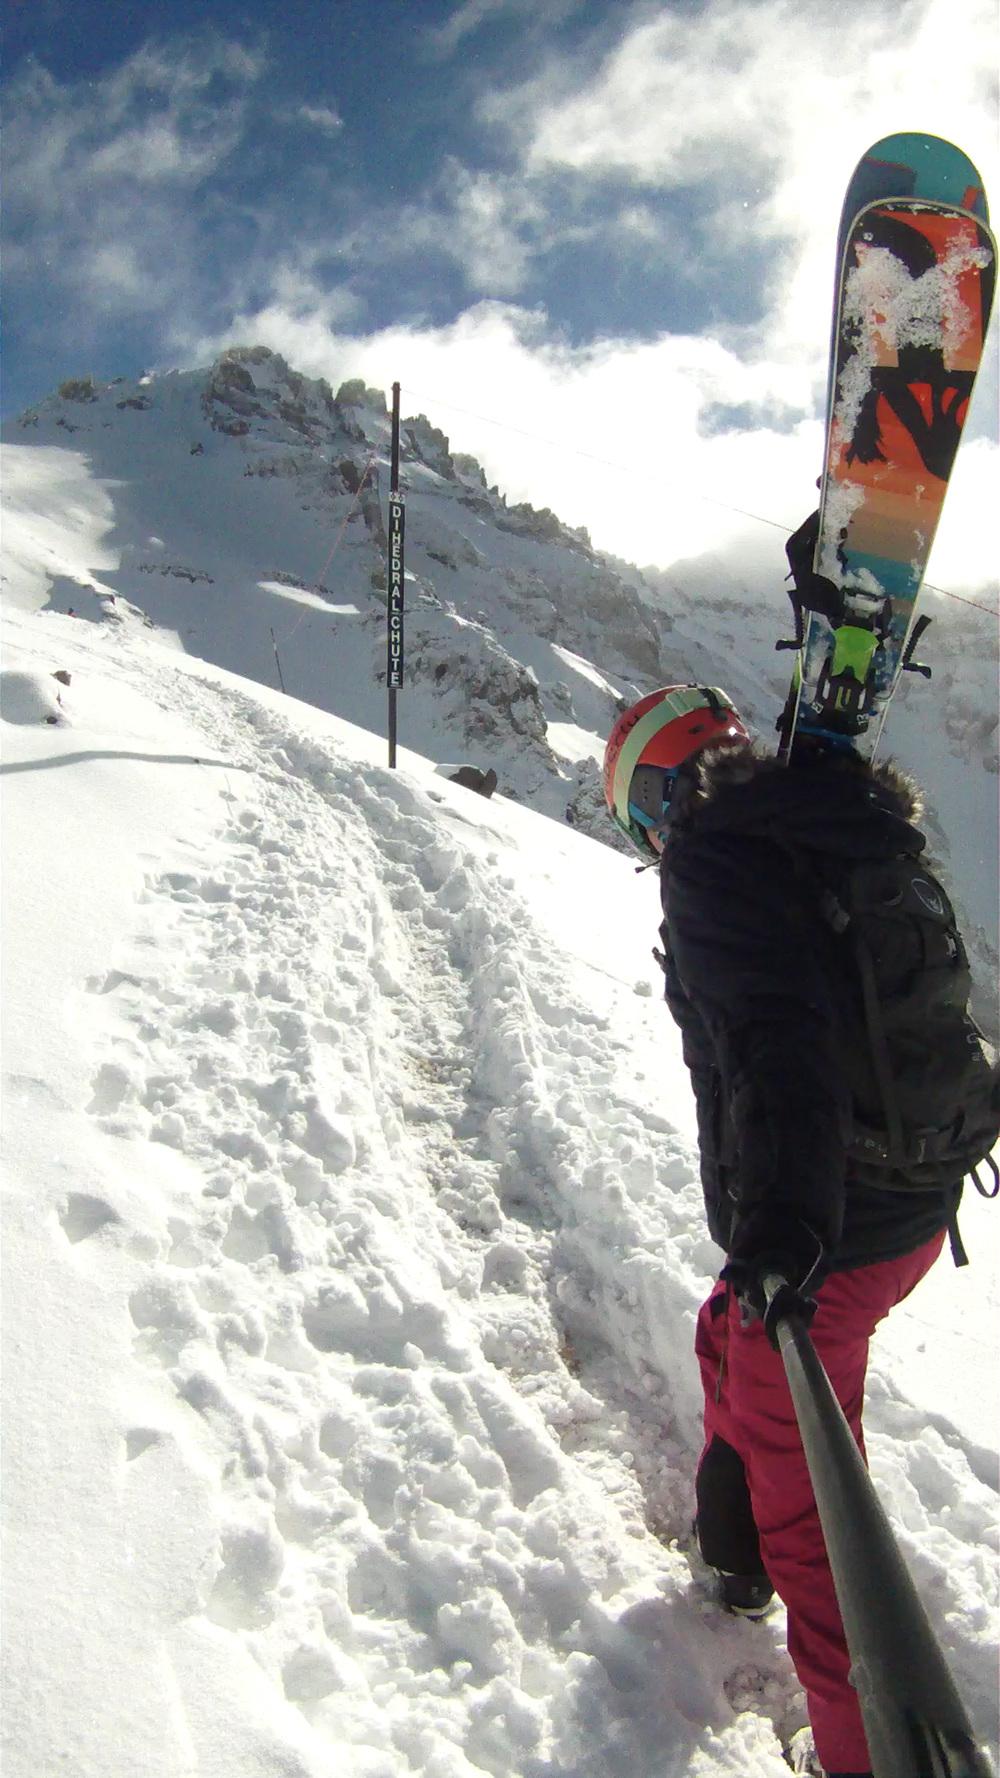 Liberty Skis Origin hiking Telluride's Black Iron Bowl